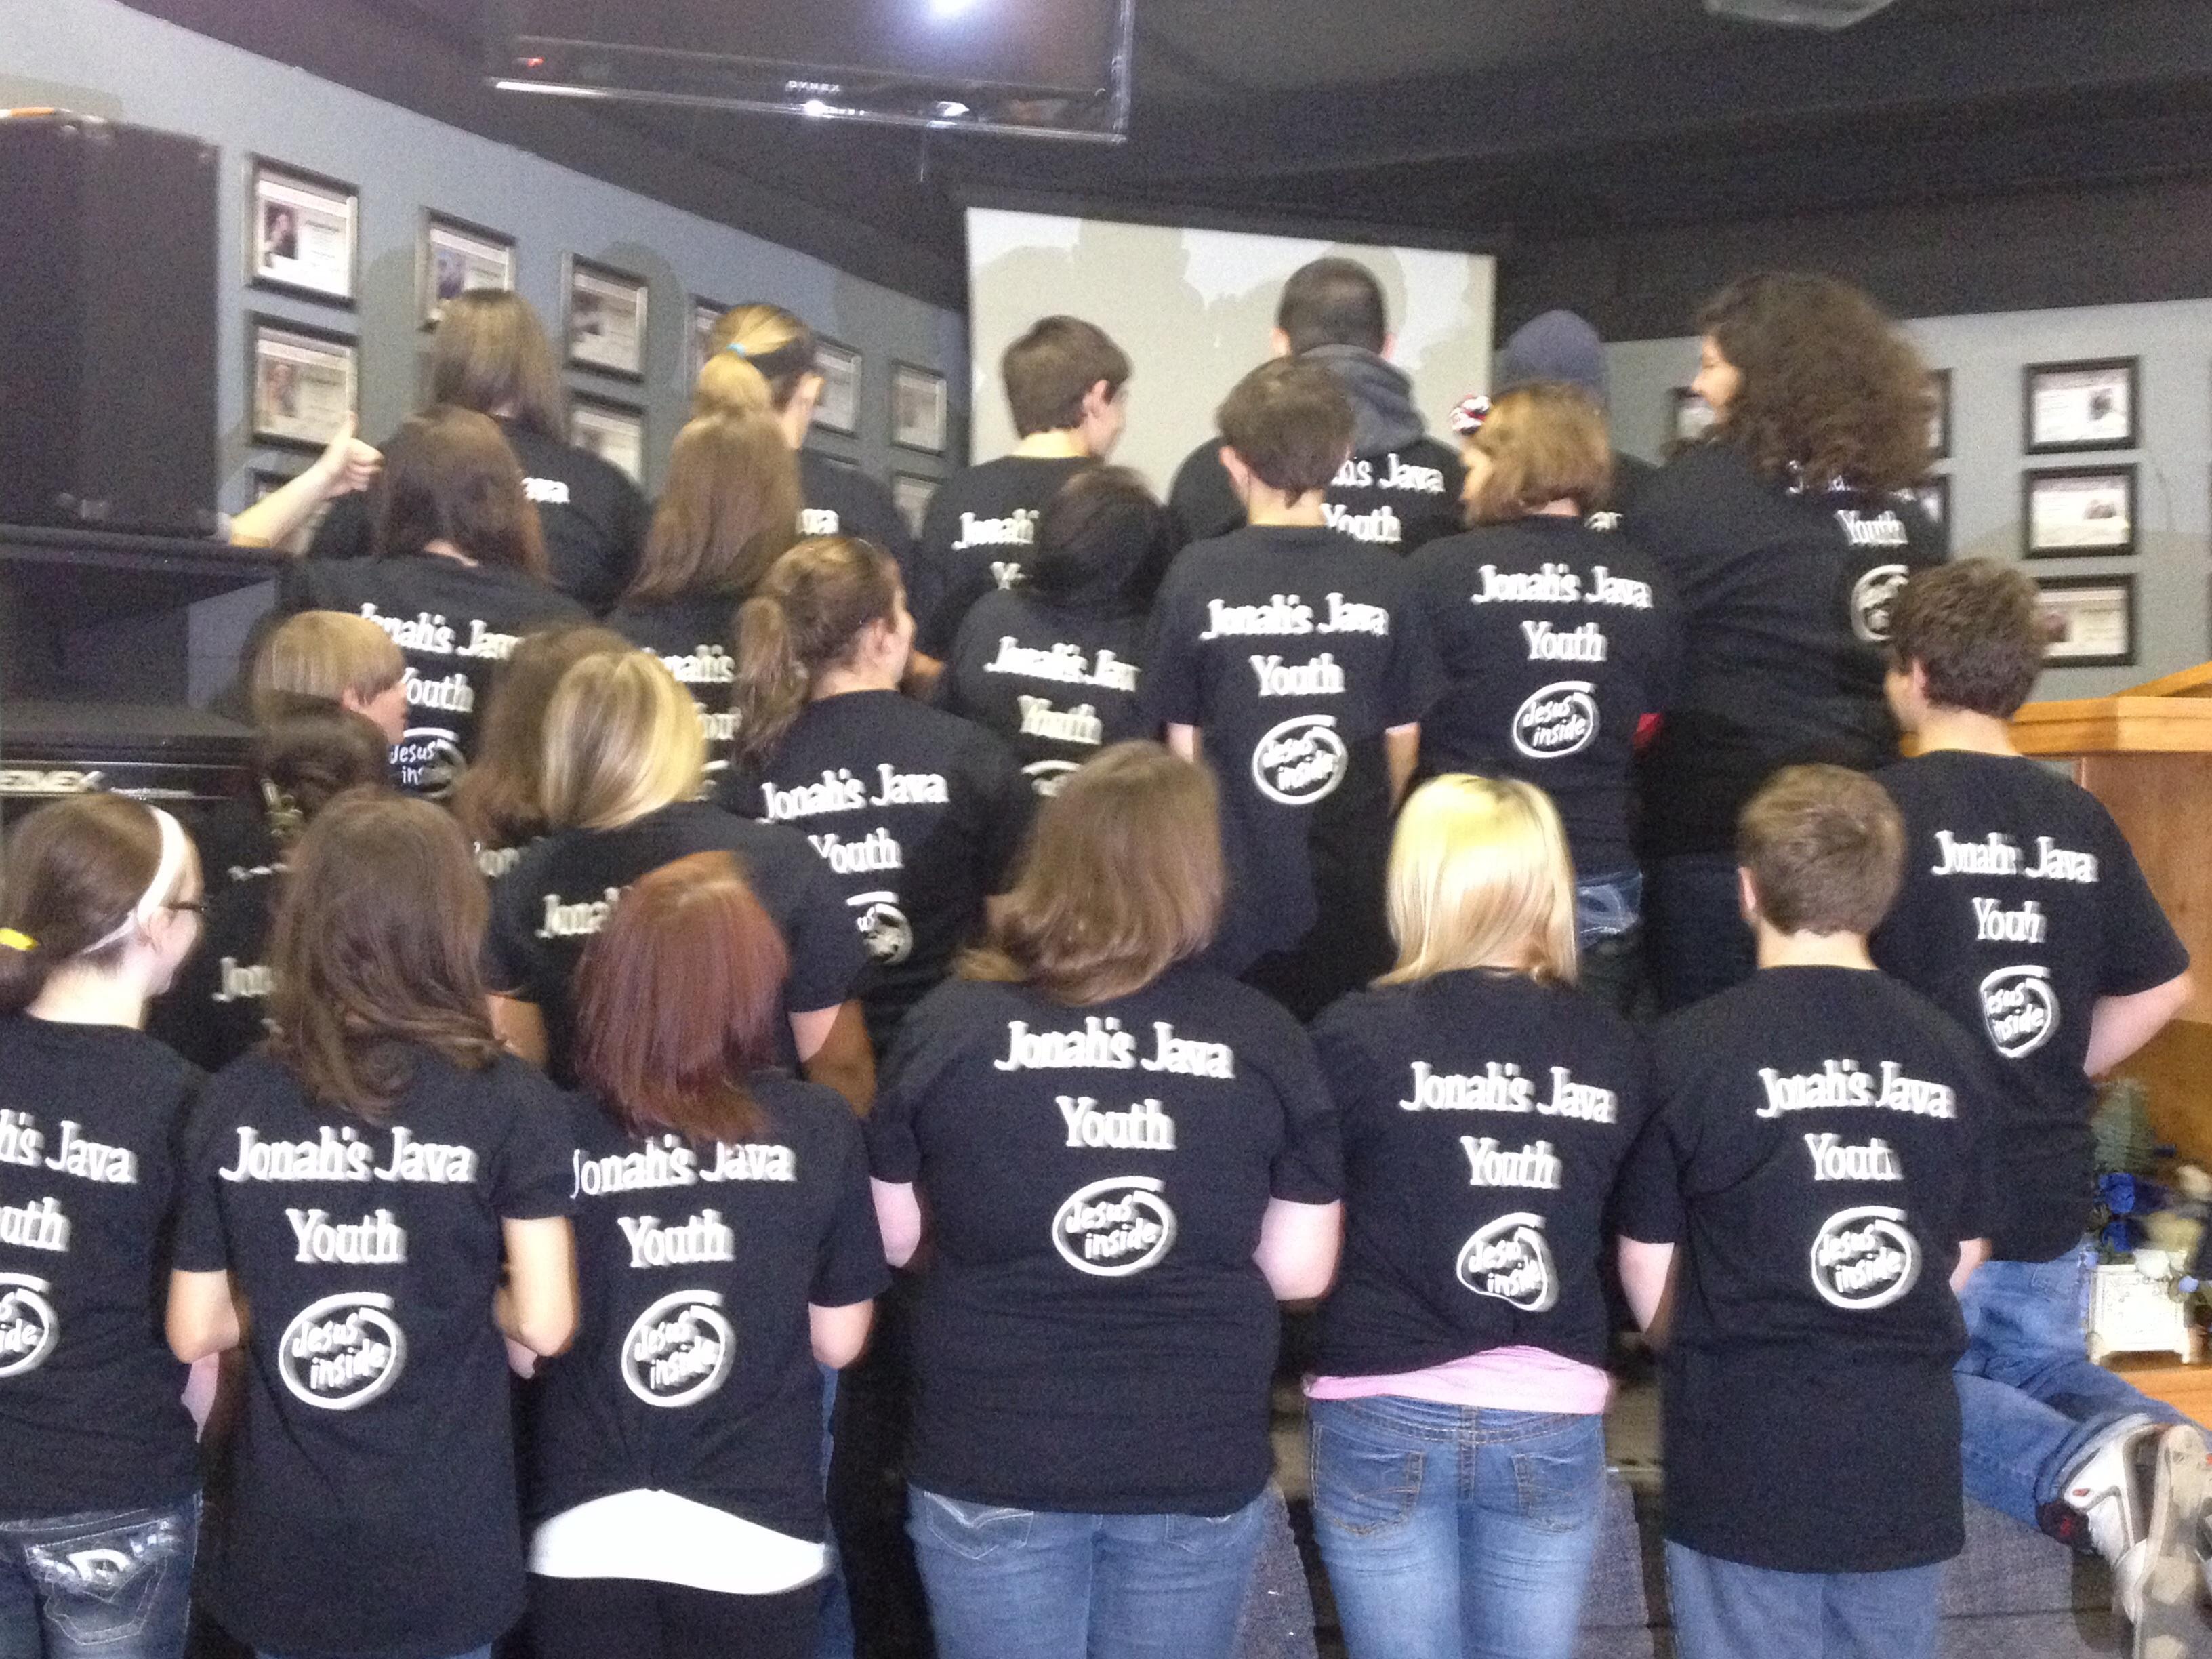 Custom T-Shirts for Jonah's Java Youth Group - Shirt Design Ideas